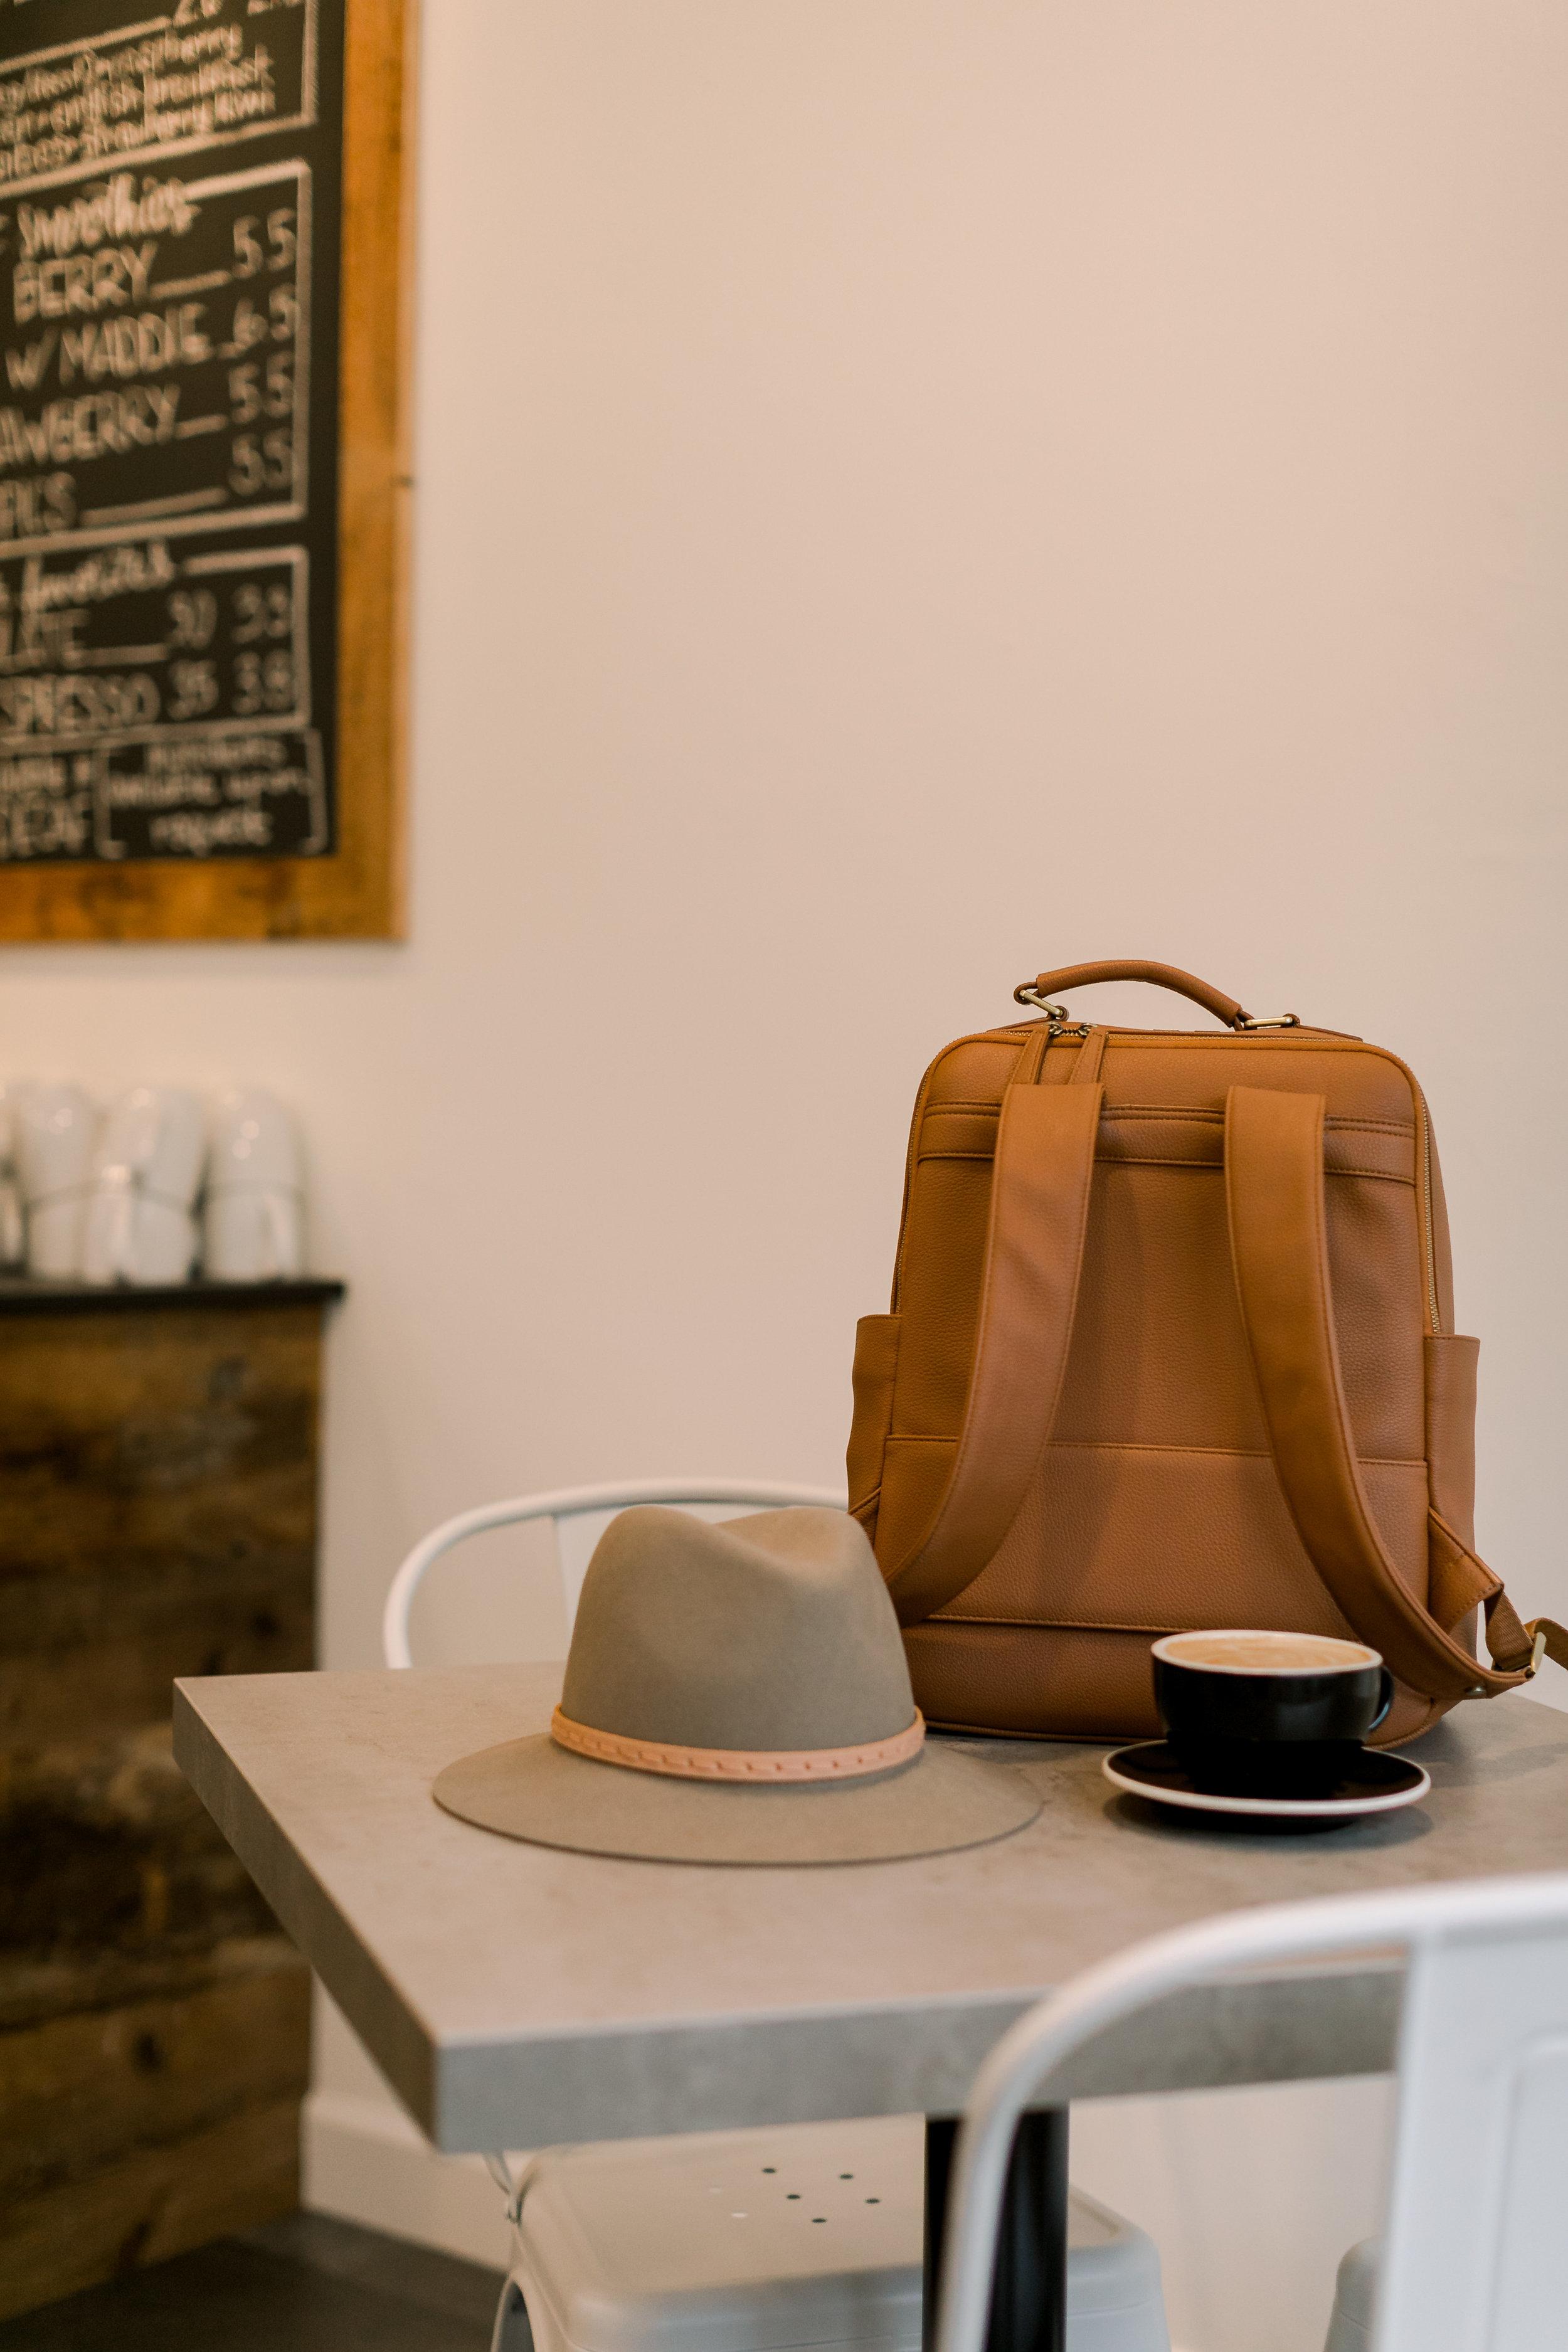 Lyra Backpack, Kamrette Leather Backpack, Professional Wedding Photographer Memphis, Slate Coffee Shop, Lititz PA